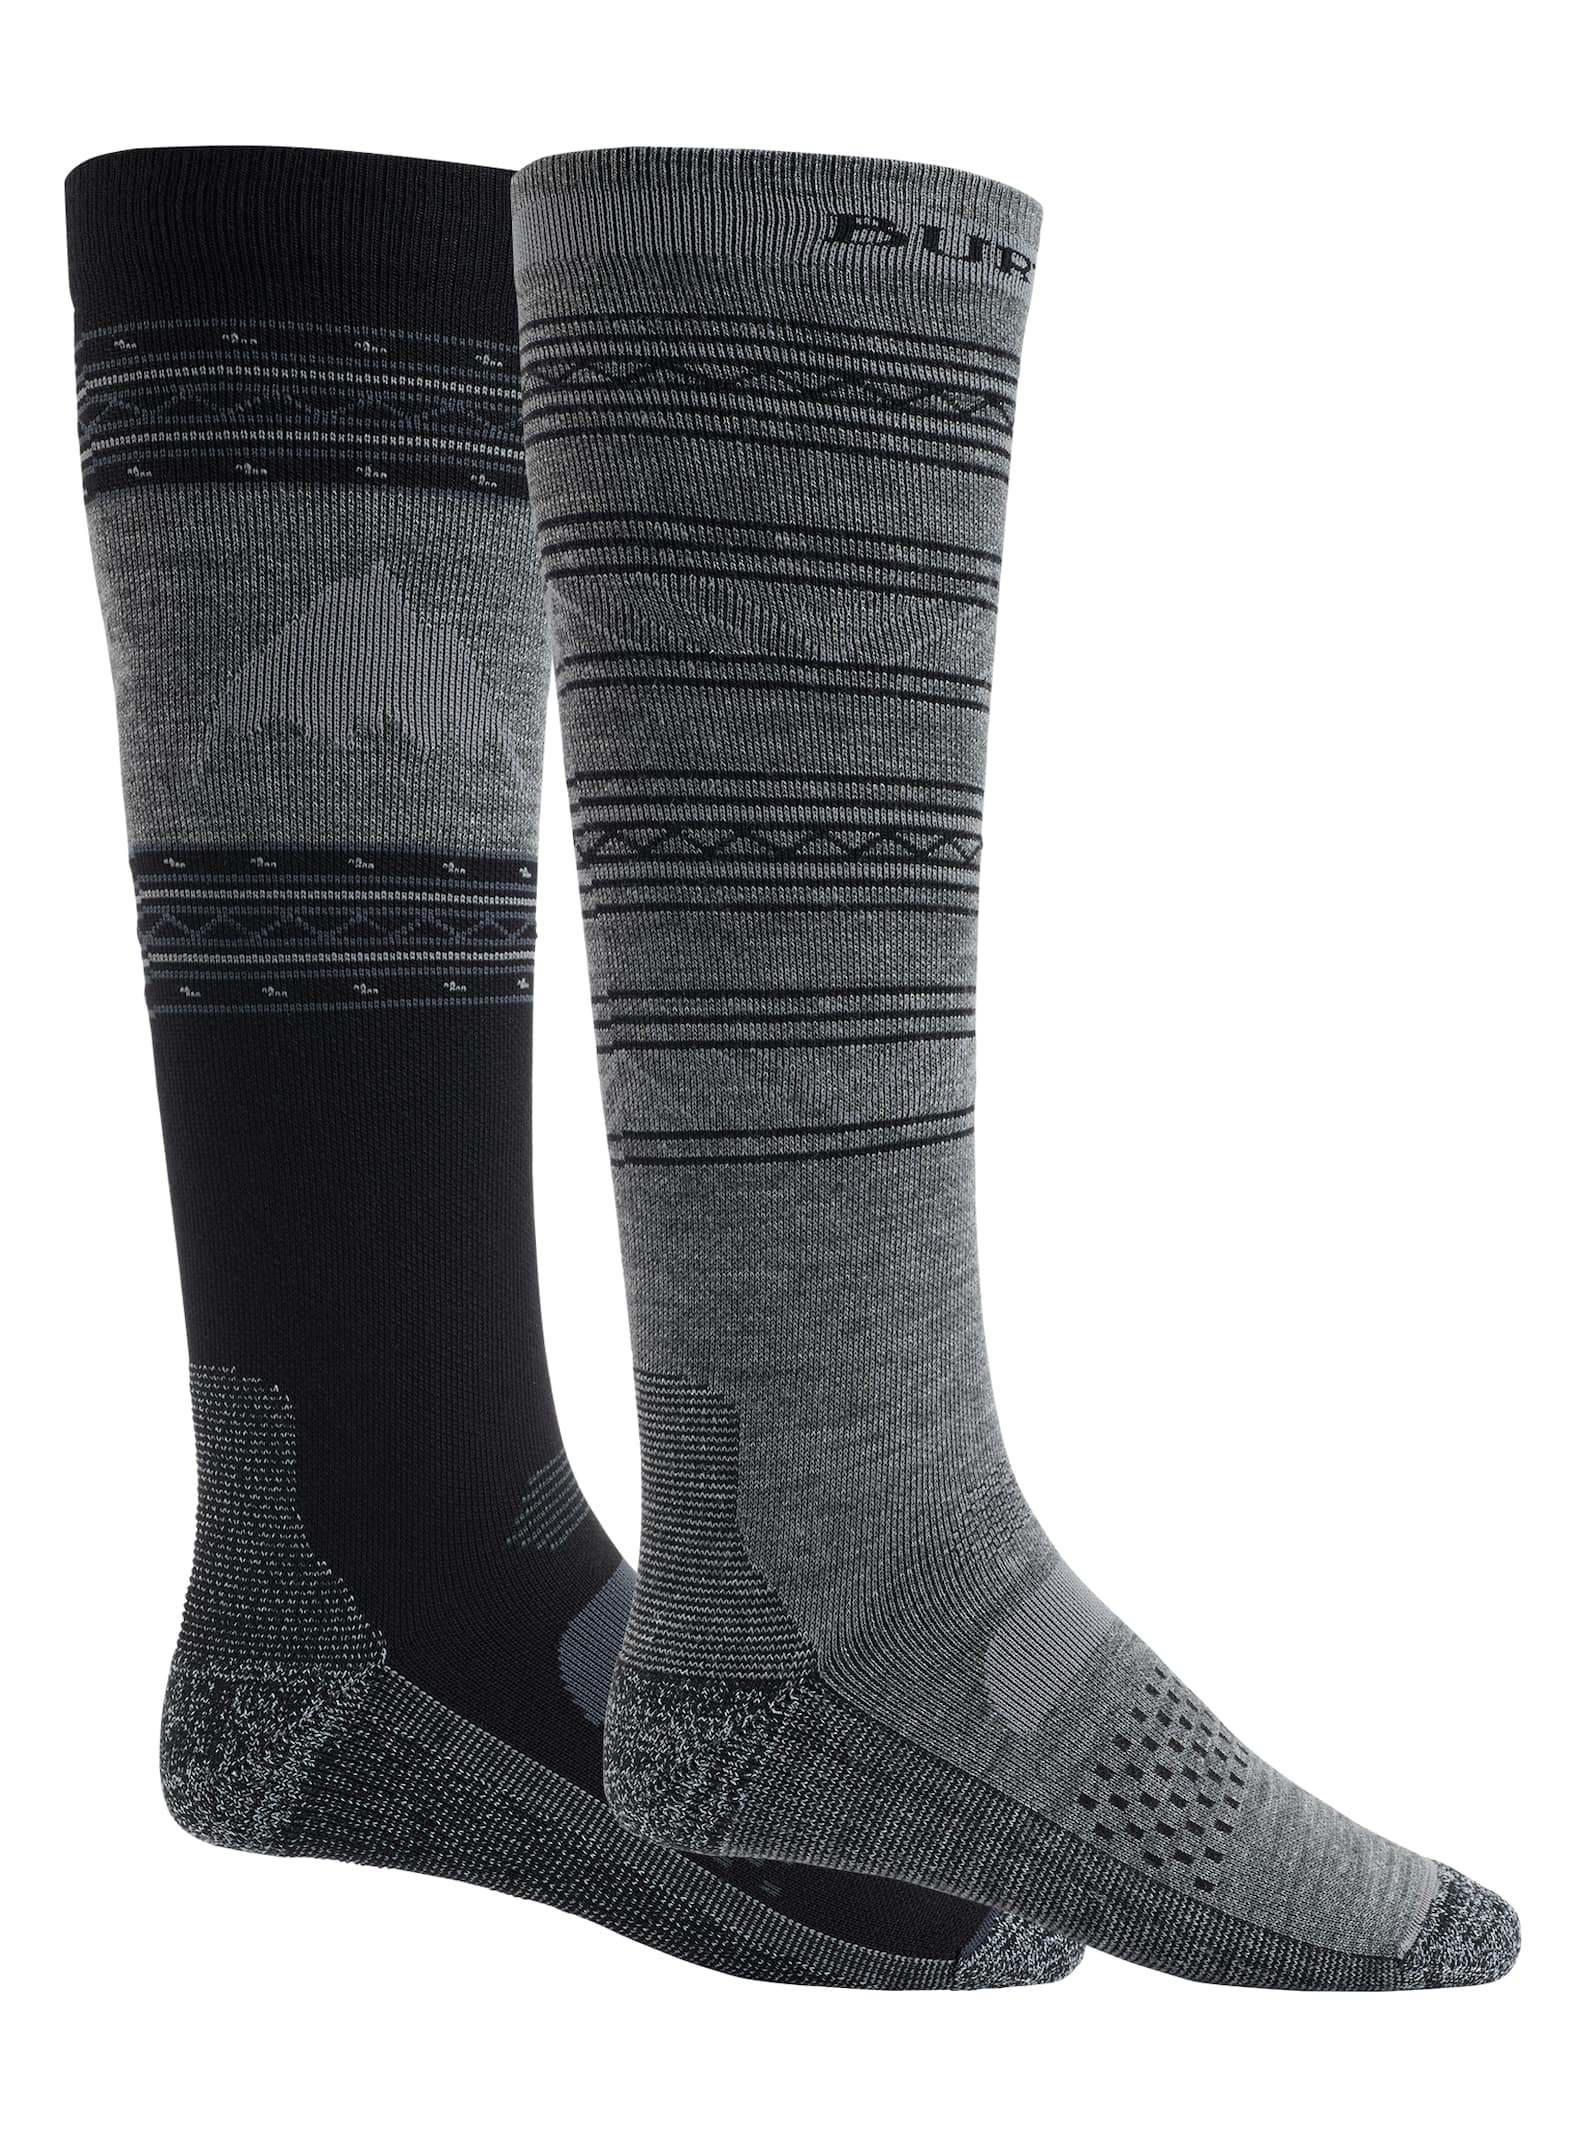 Men's Socks Burton Men's Performance Lightweight Sock 2-Pack, True Black, M